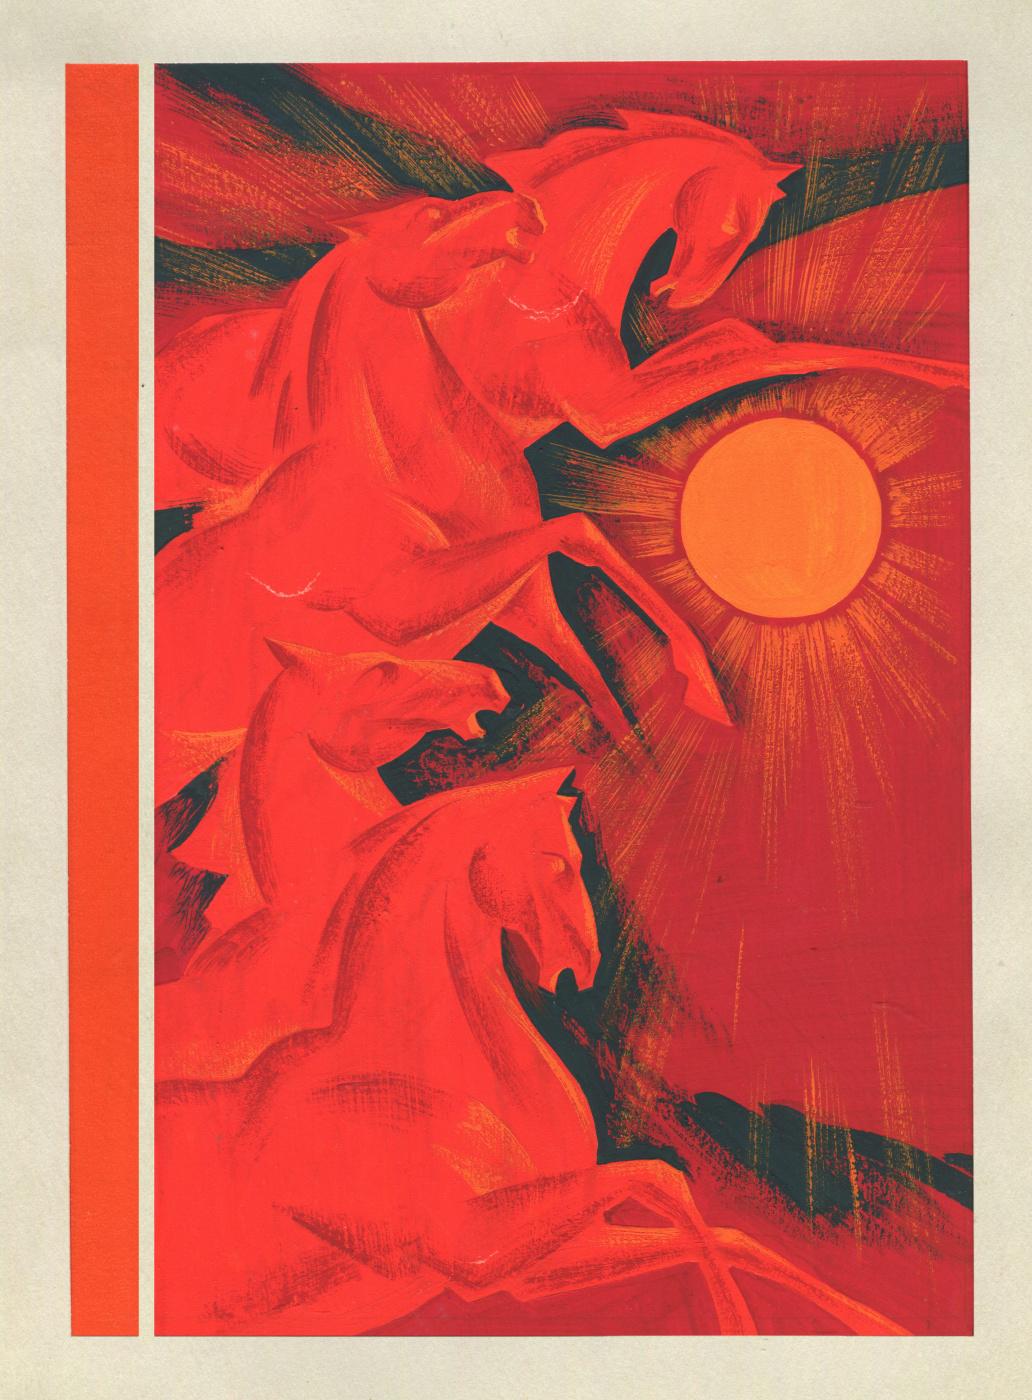 Alexandrovich Rudolf Pavlov. Let it shine, A. Gaidar. Cover option 4. South Ural Book Publishing House.